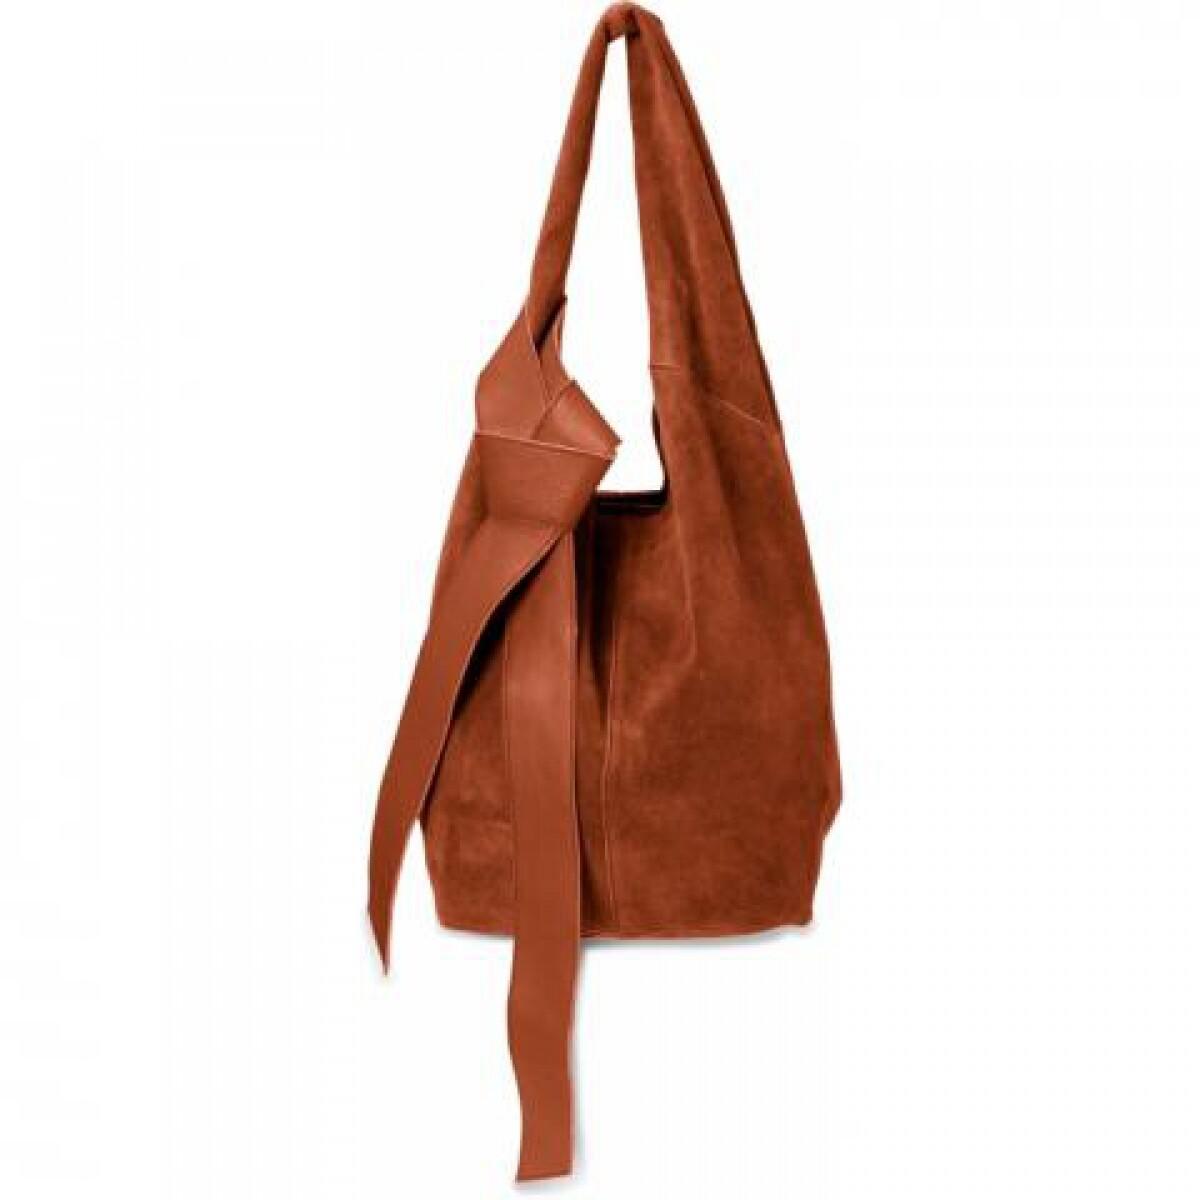 YAYA Suede shopper with strap RUSTY BROWN